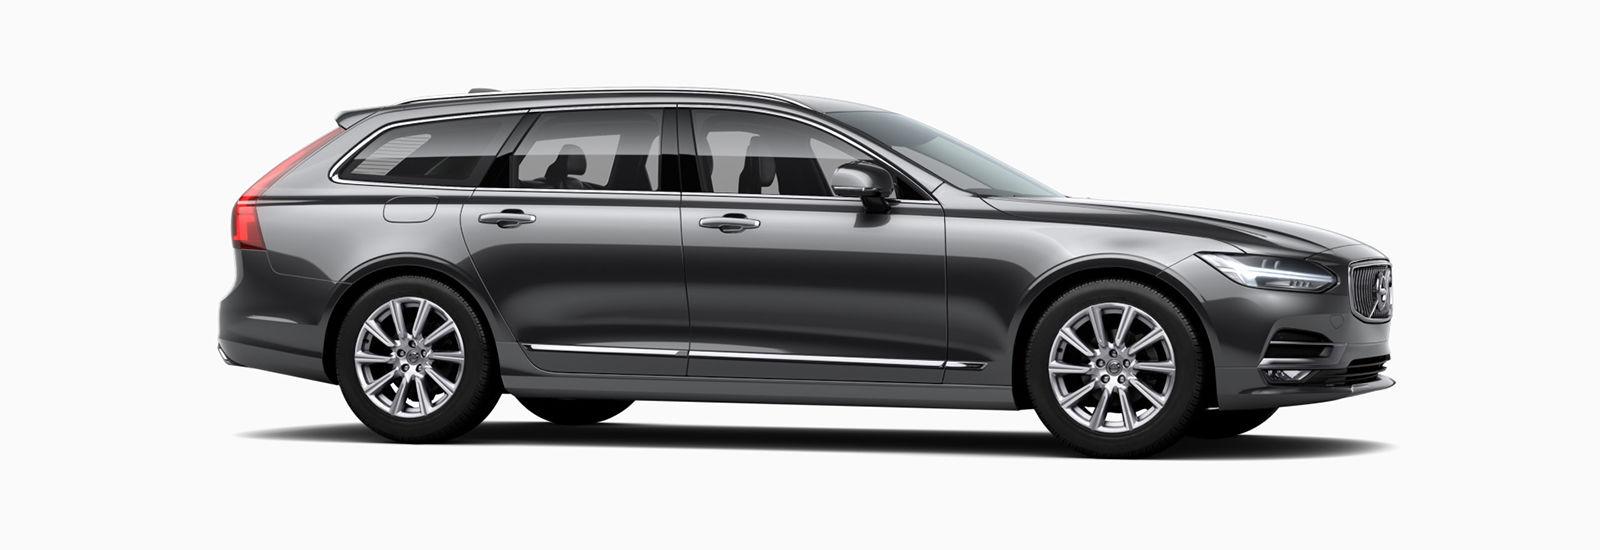 Volvo s60 savile grey metallic images - Savile Grey 700